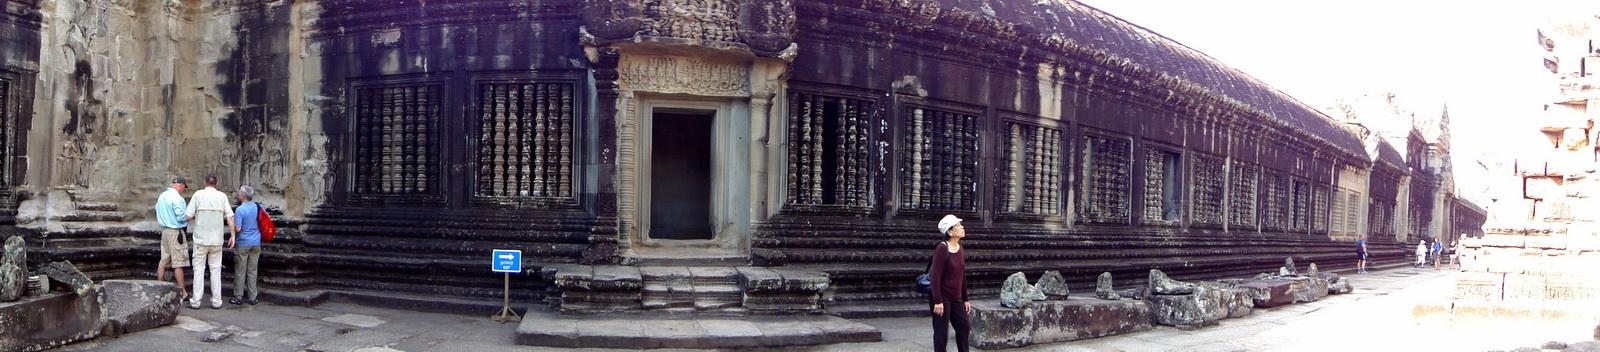 Angkor Wat Khmer architecture inner sanctuary courtyard 02